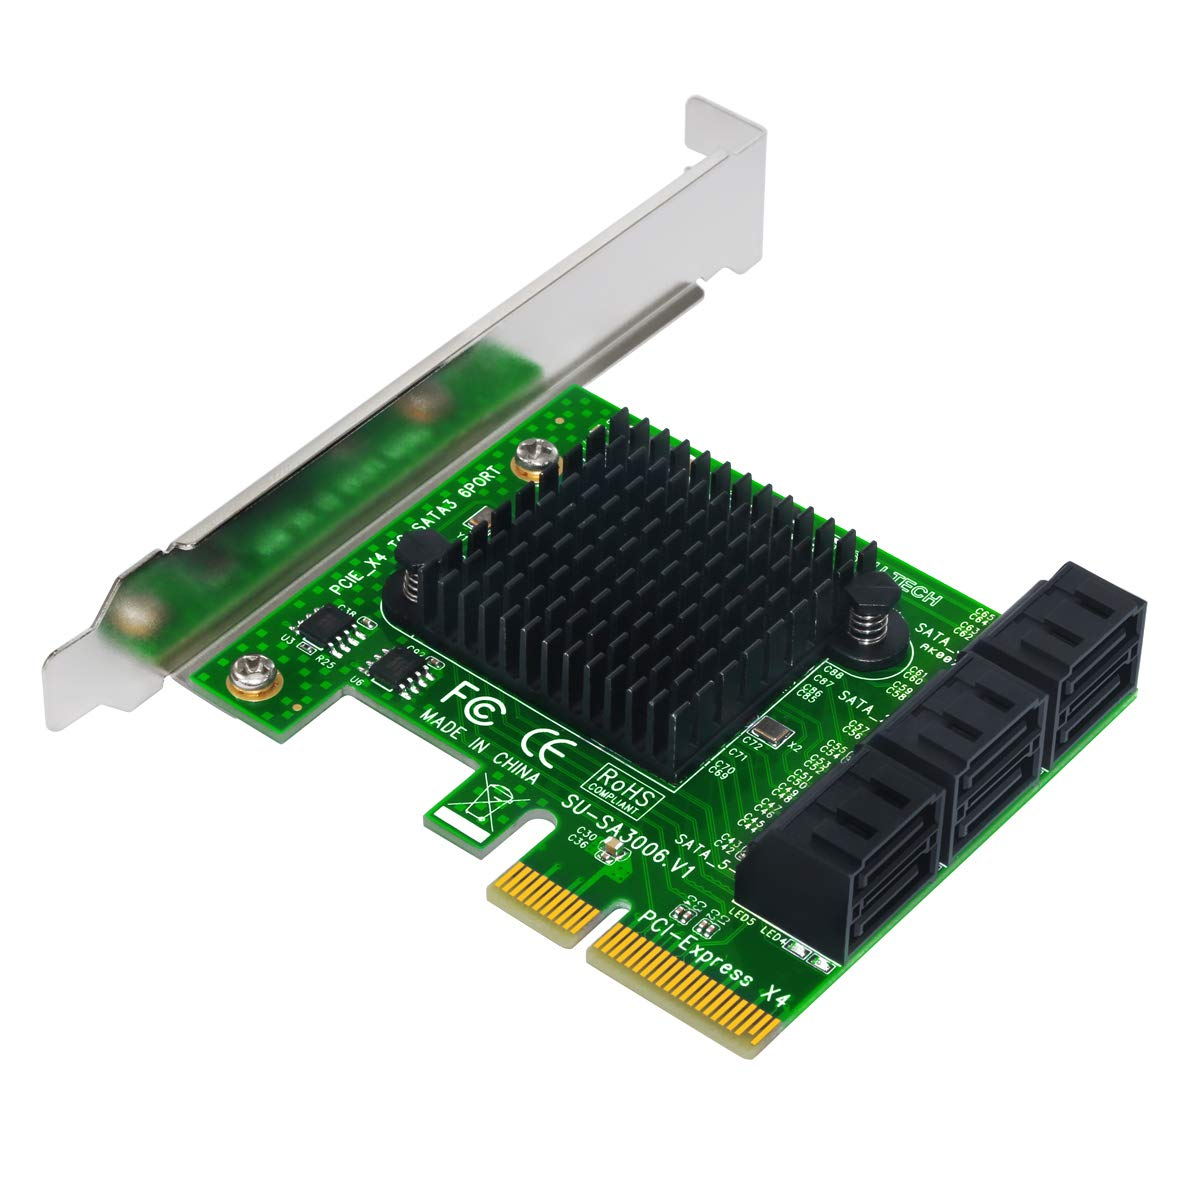 Expansion Card,Ubit Riser Card,PCIe 2.0 X2 to SATA III 6-Port Adapter Card (ASM Chipset) for IPFS Mining,Pci-e to SATA3.0 Expansion Card,SATA3.0 Riser Card 6G IPFS Hard Disk Expansion Card